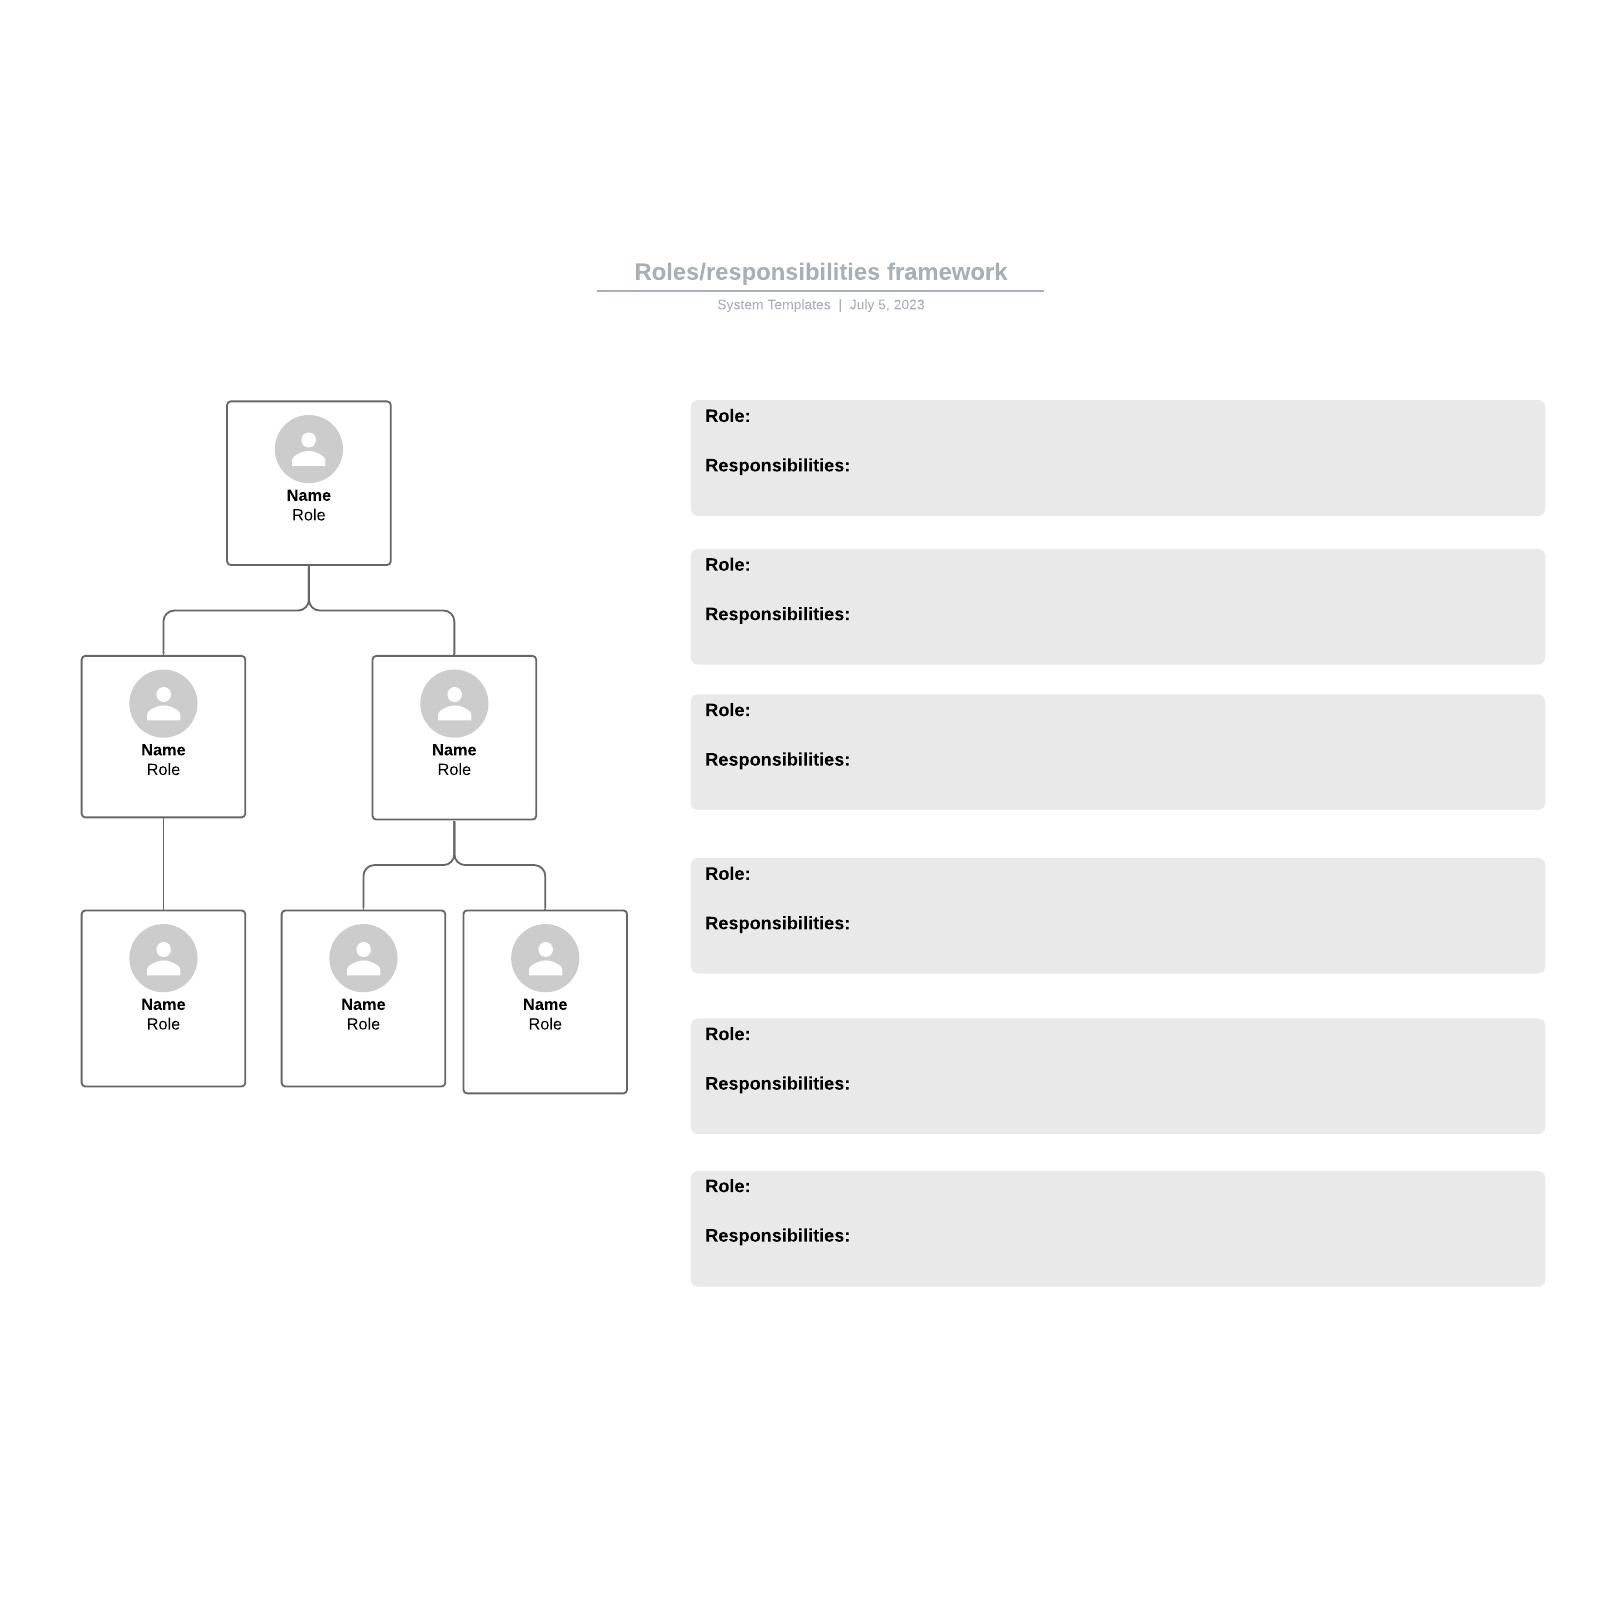 Roles/responsibilities framework